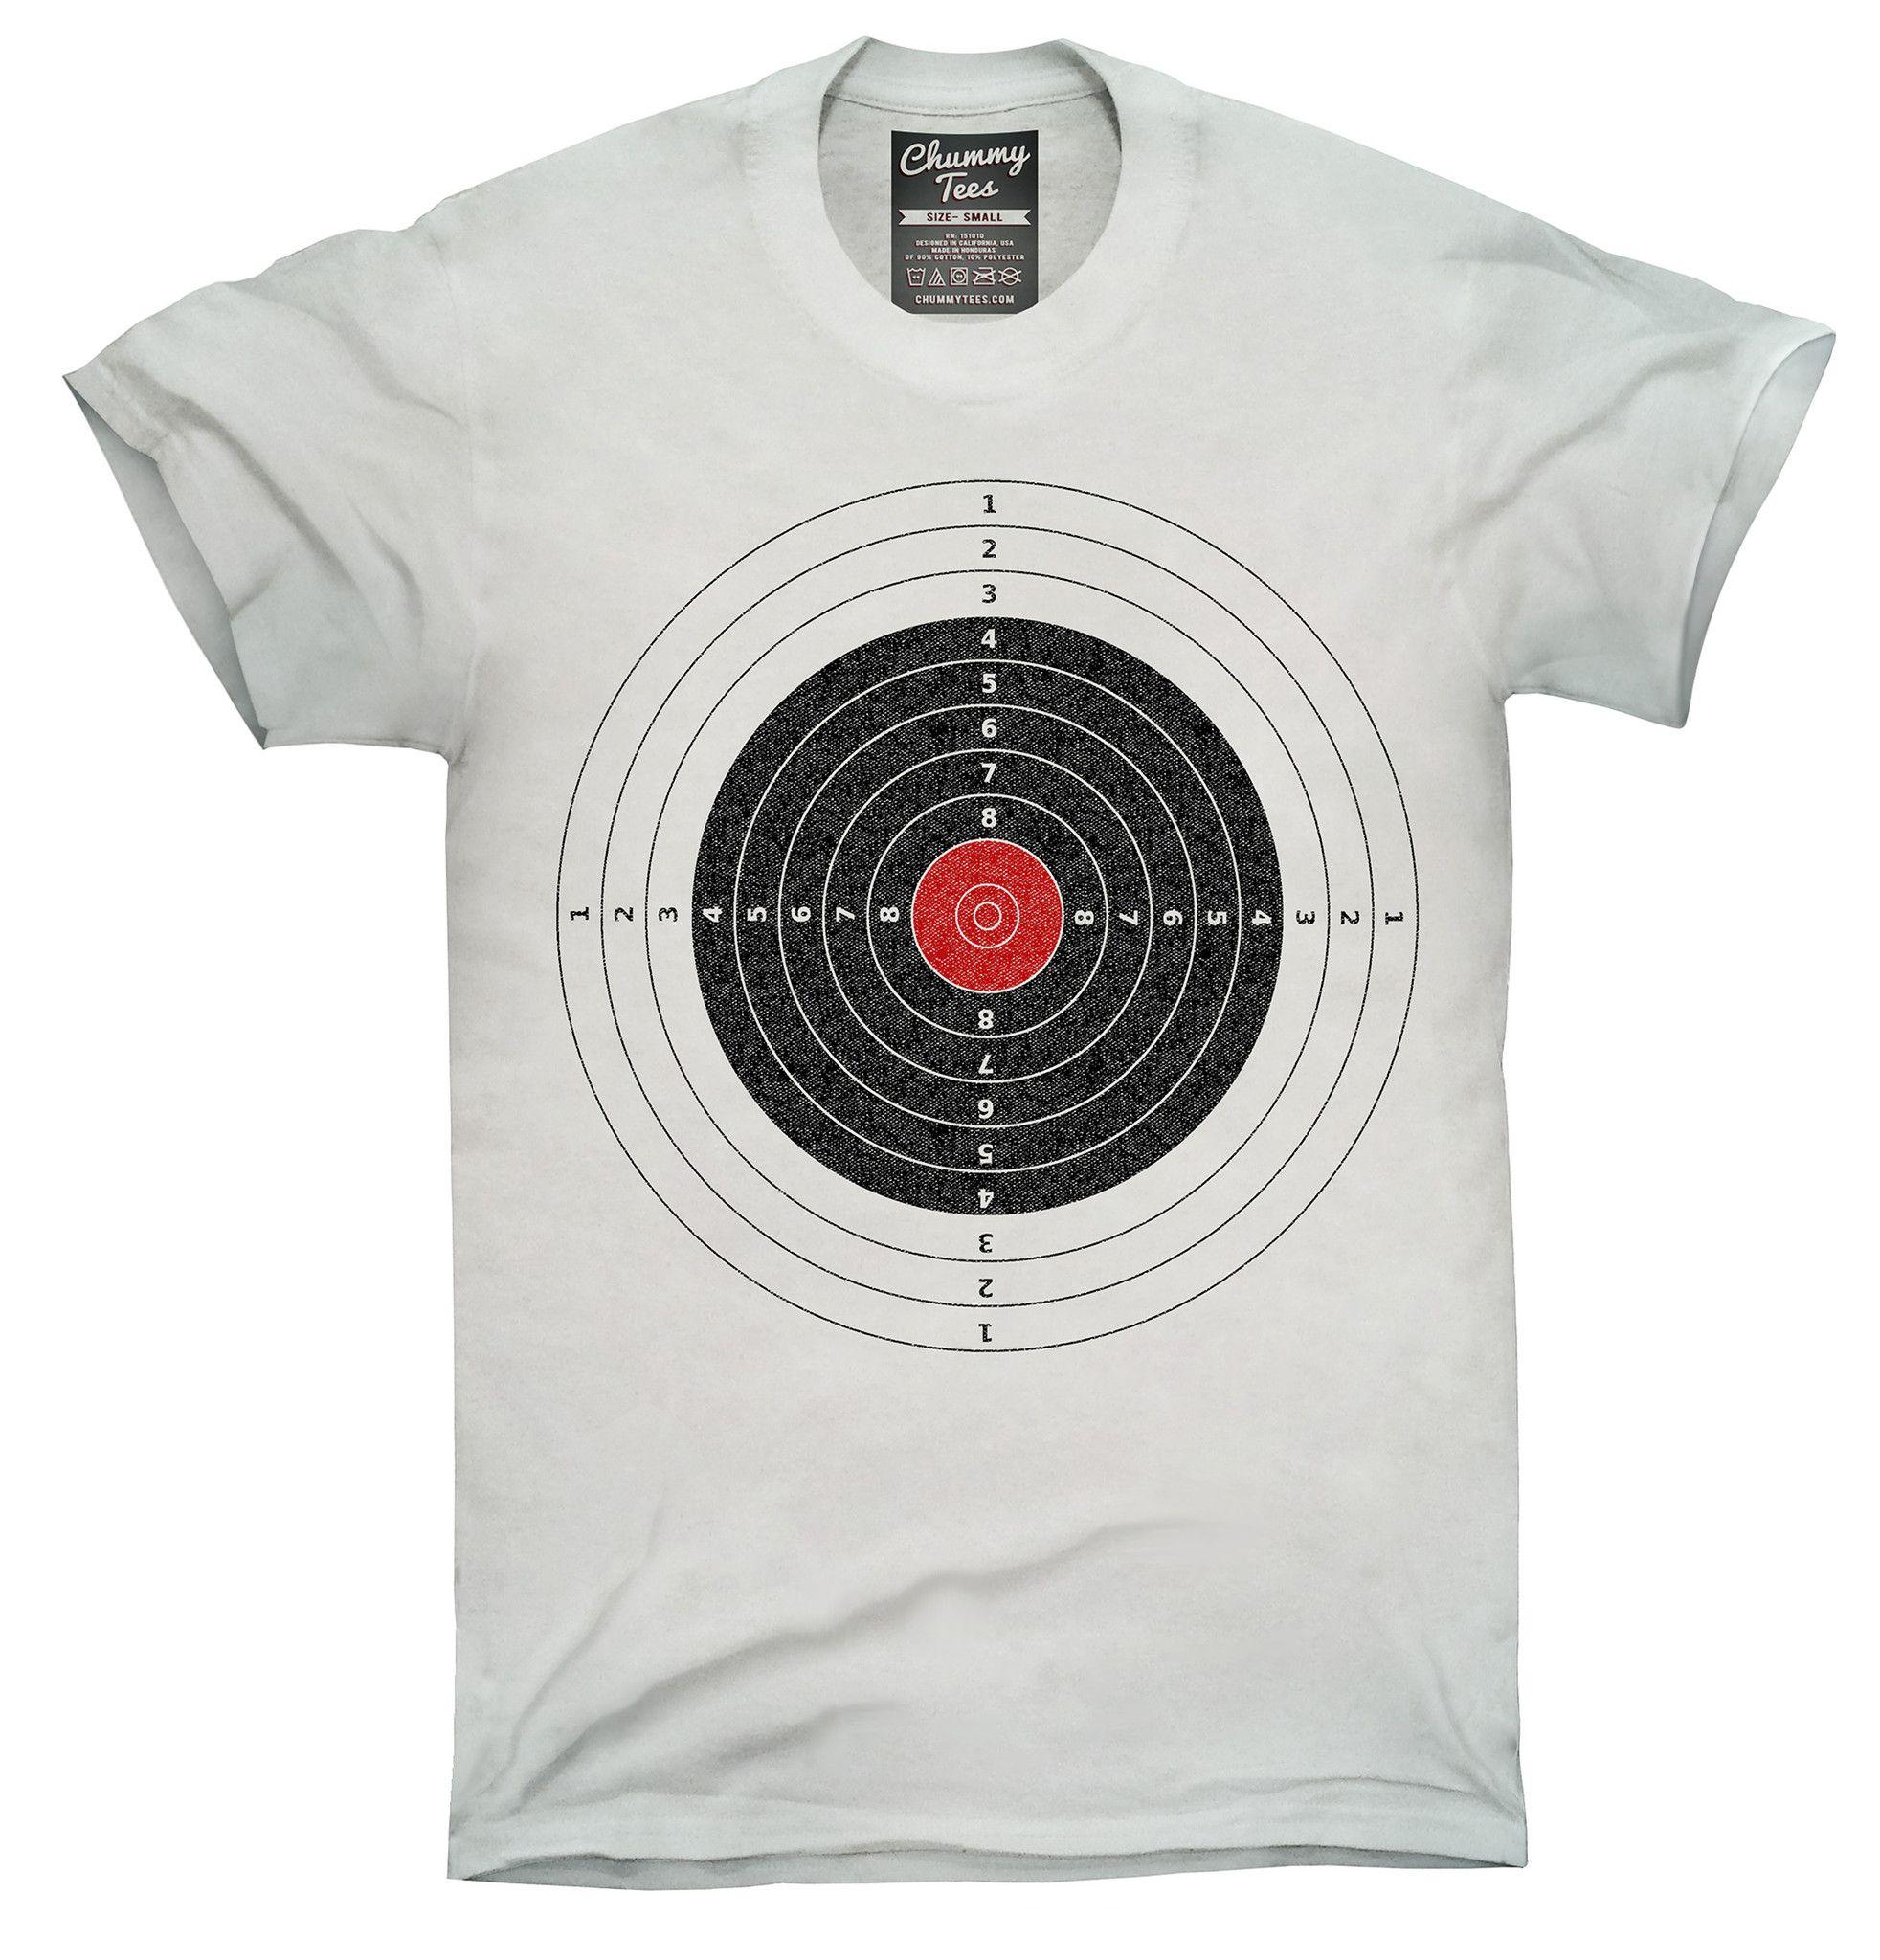 Comical Shirt Mens Blink If You Want Me Funny Sexual Shirt Tank Top